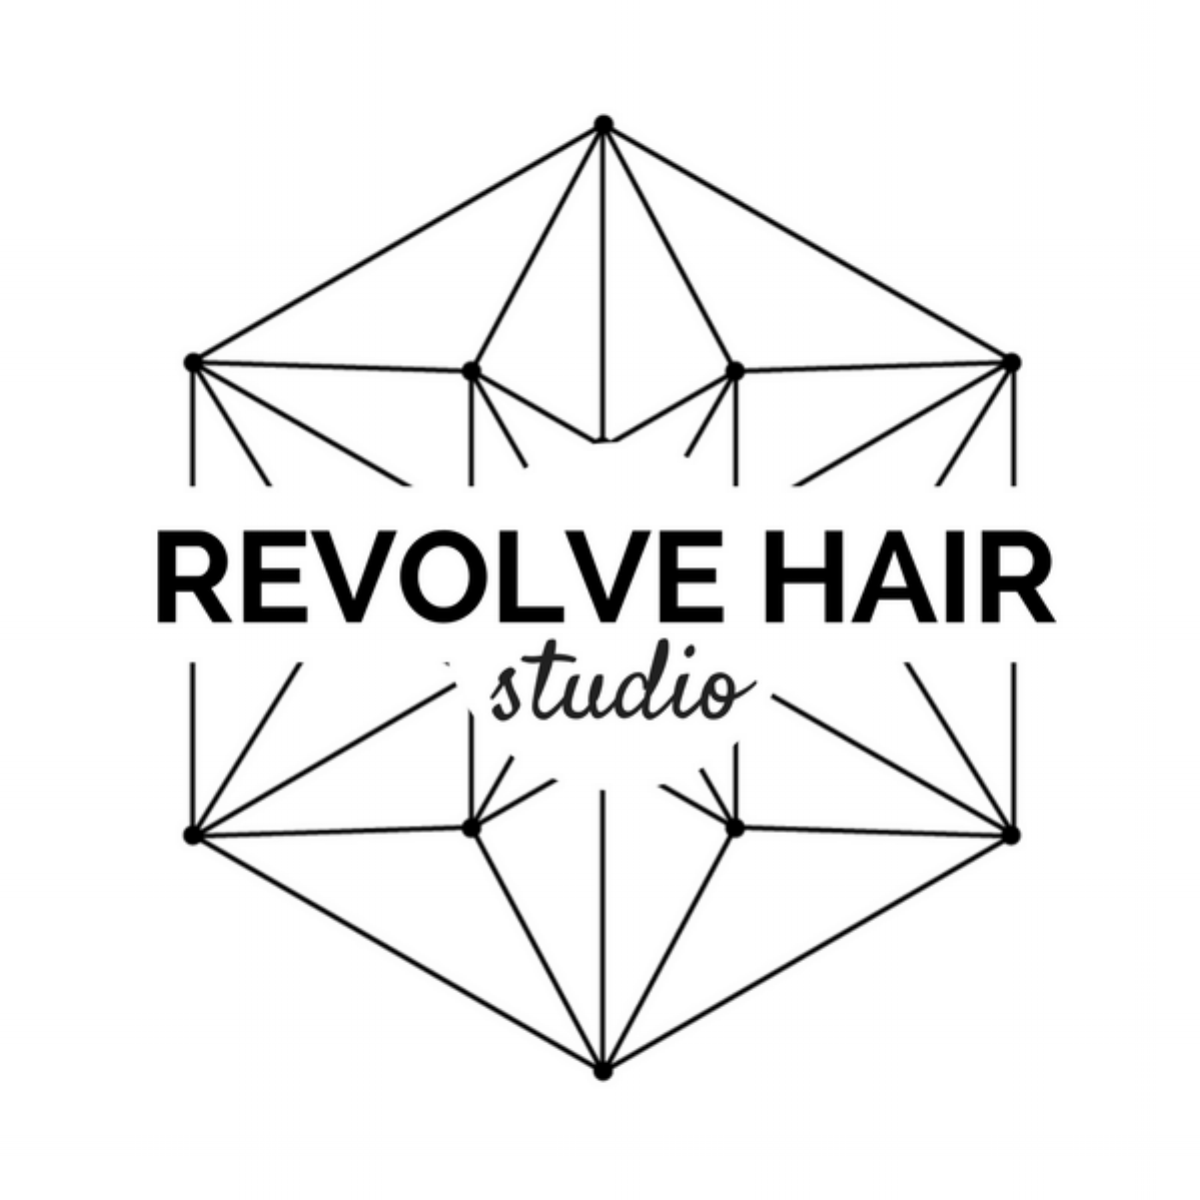 Revolve Hair Studio